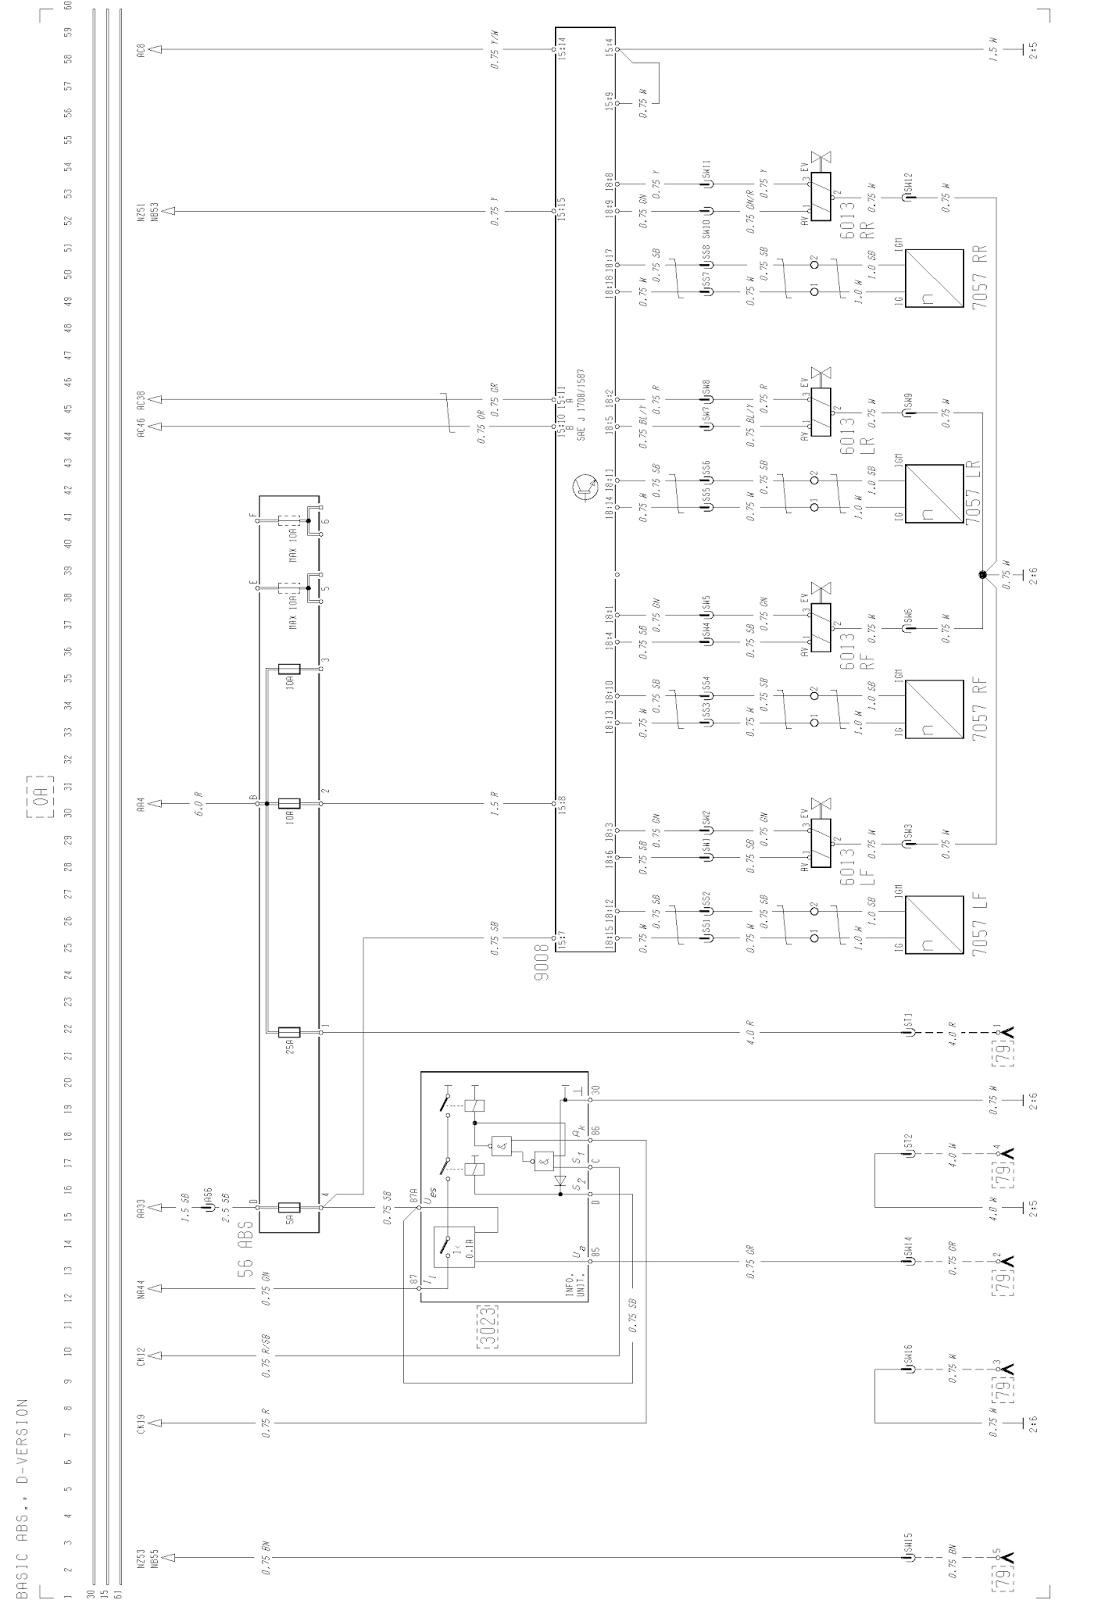 volvo fh12 service manual pdf